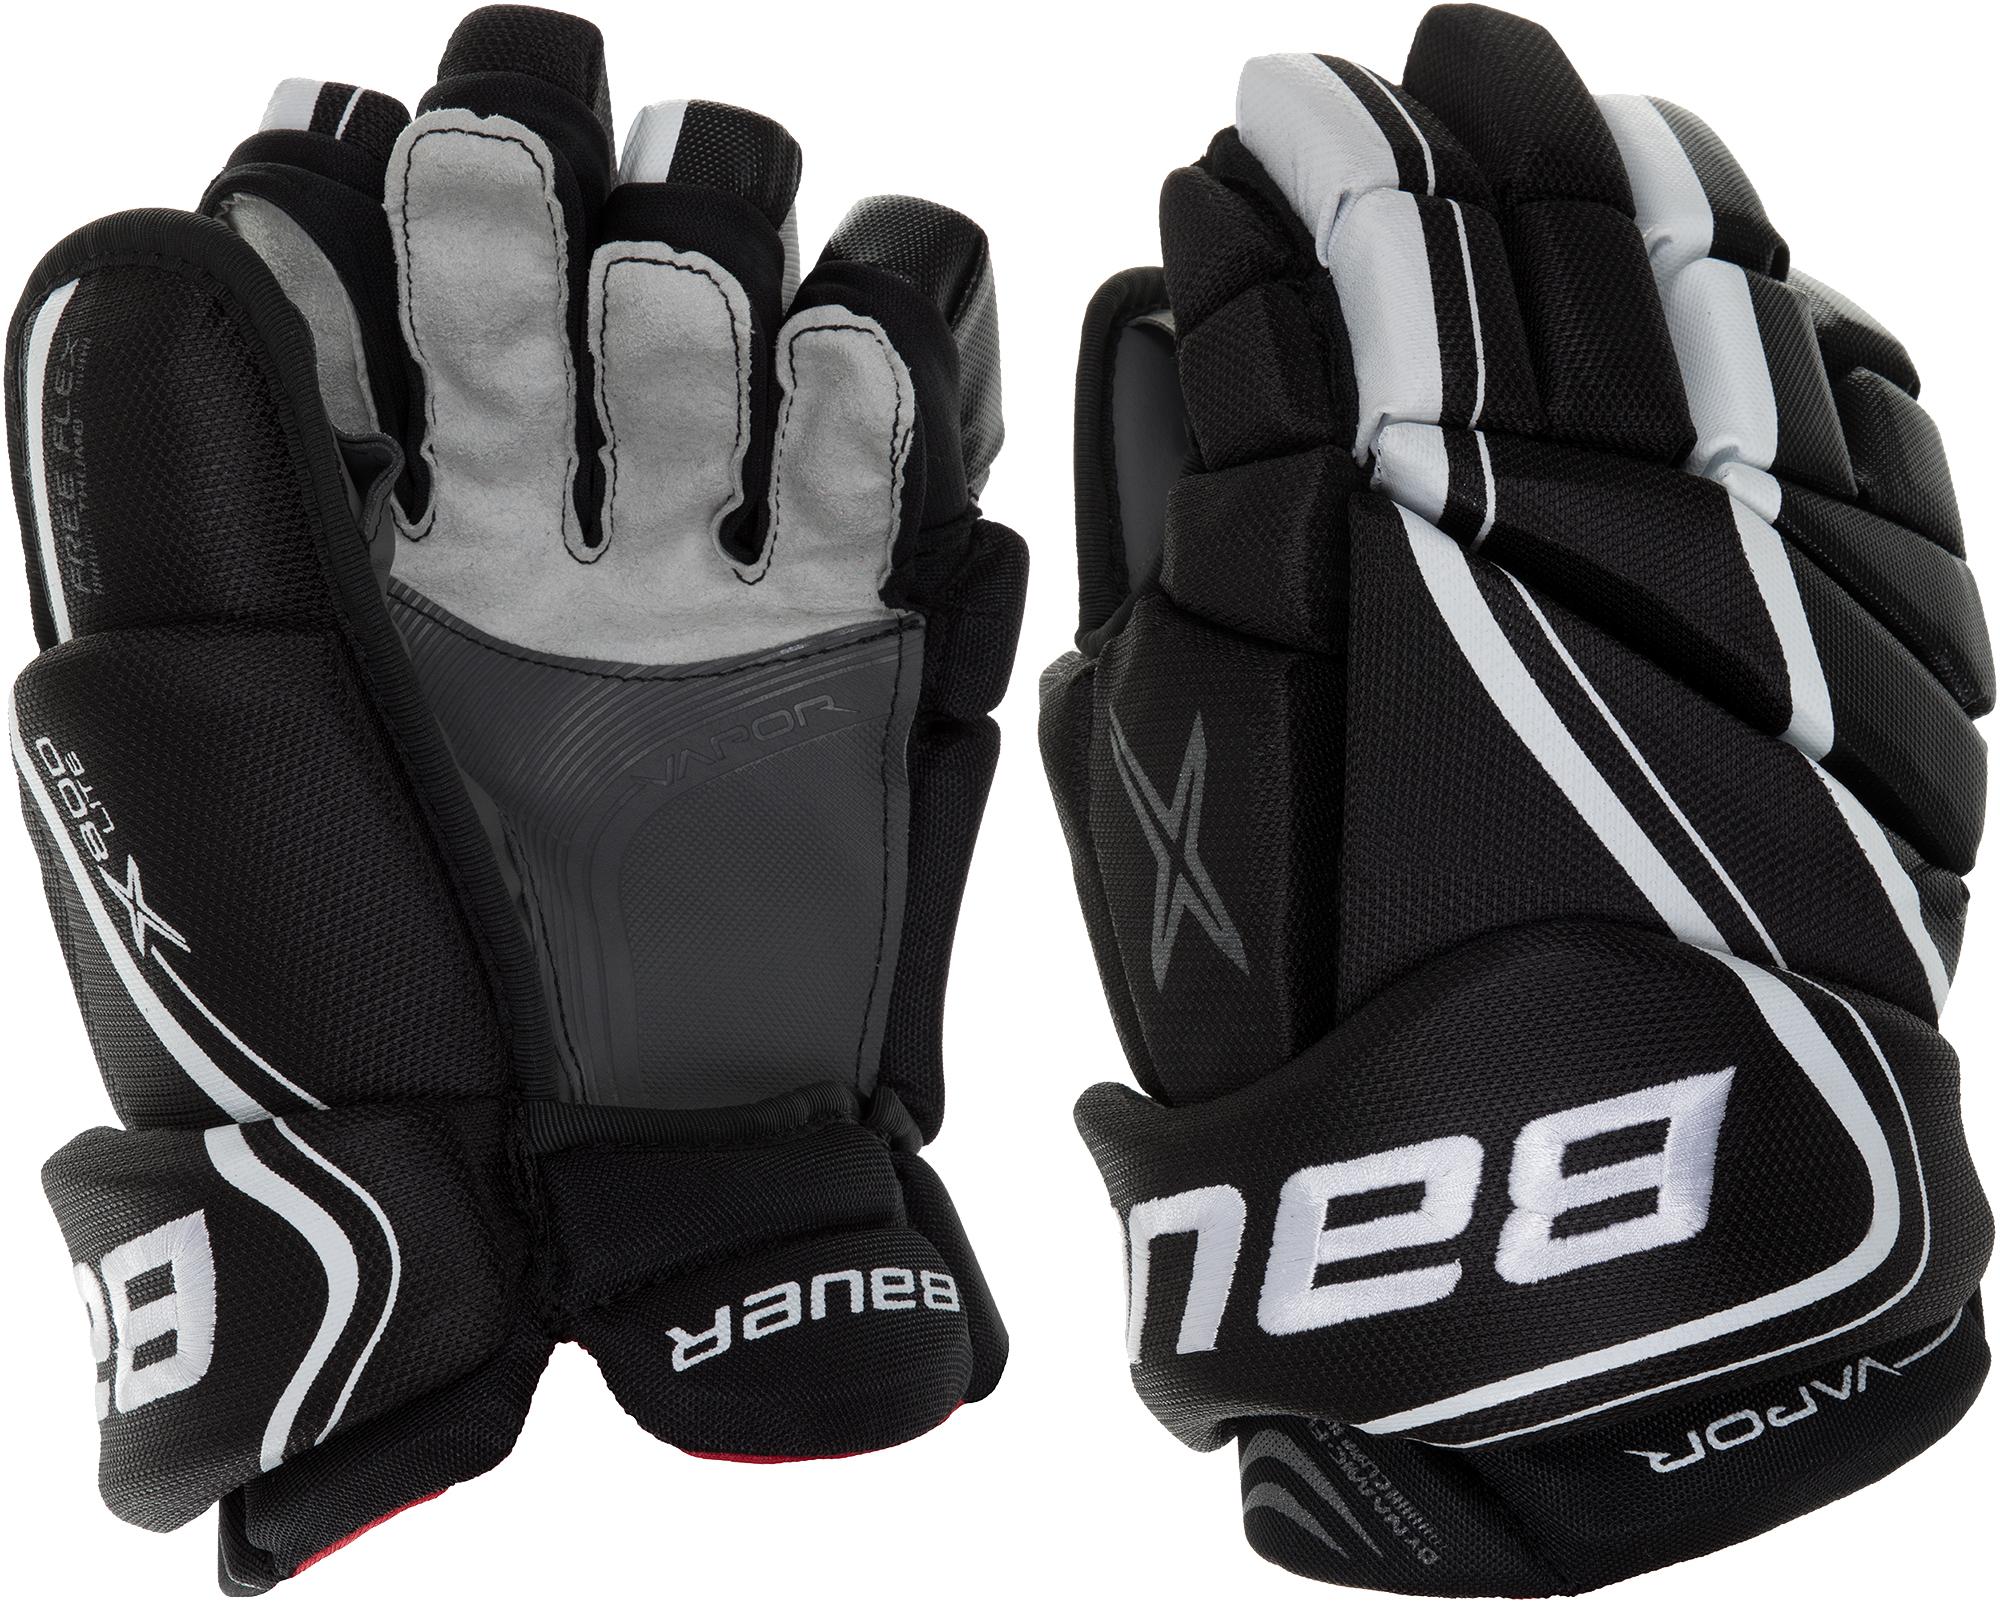 Bauer Перчатки хоккейные Bauer S18 Vapor X800 Lite, размер 12,5 цена 2017